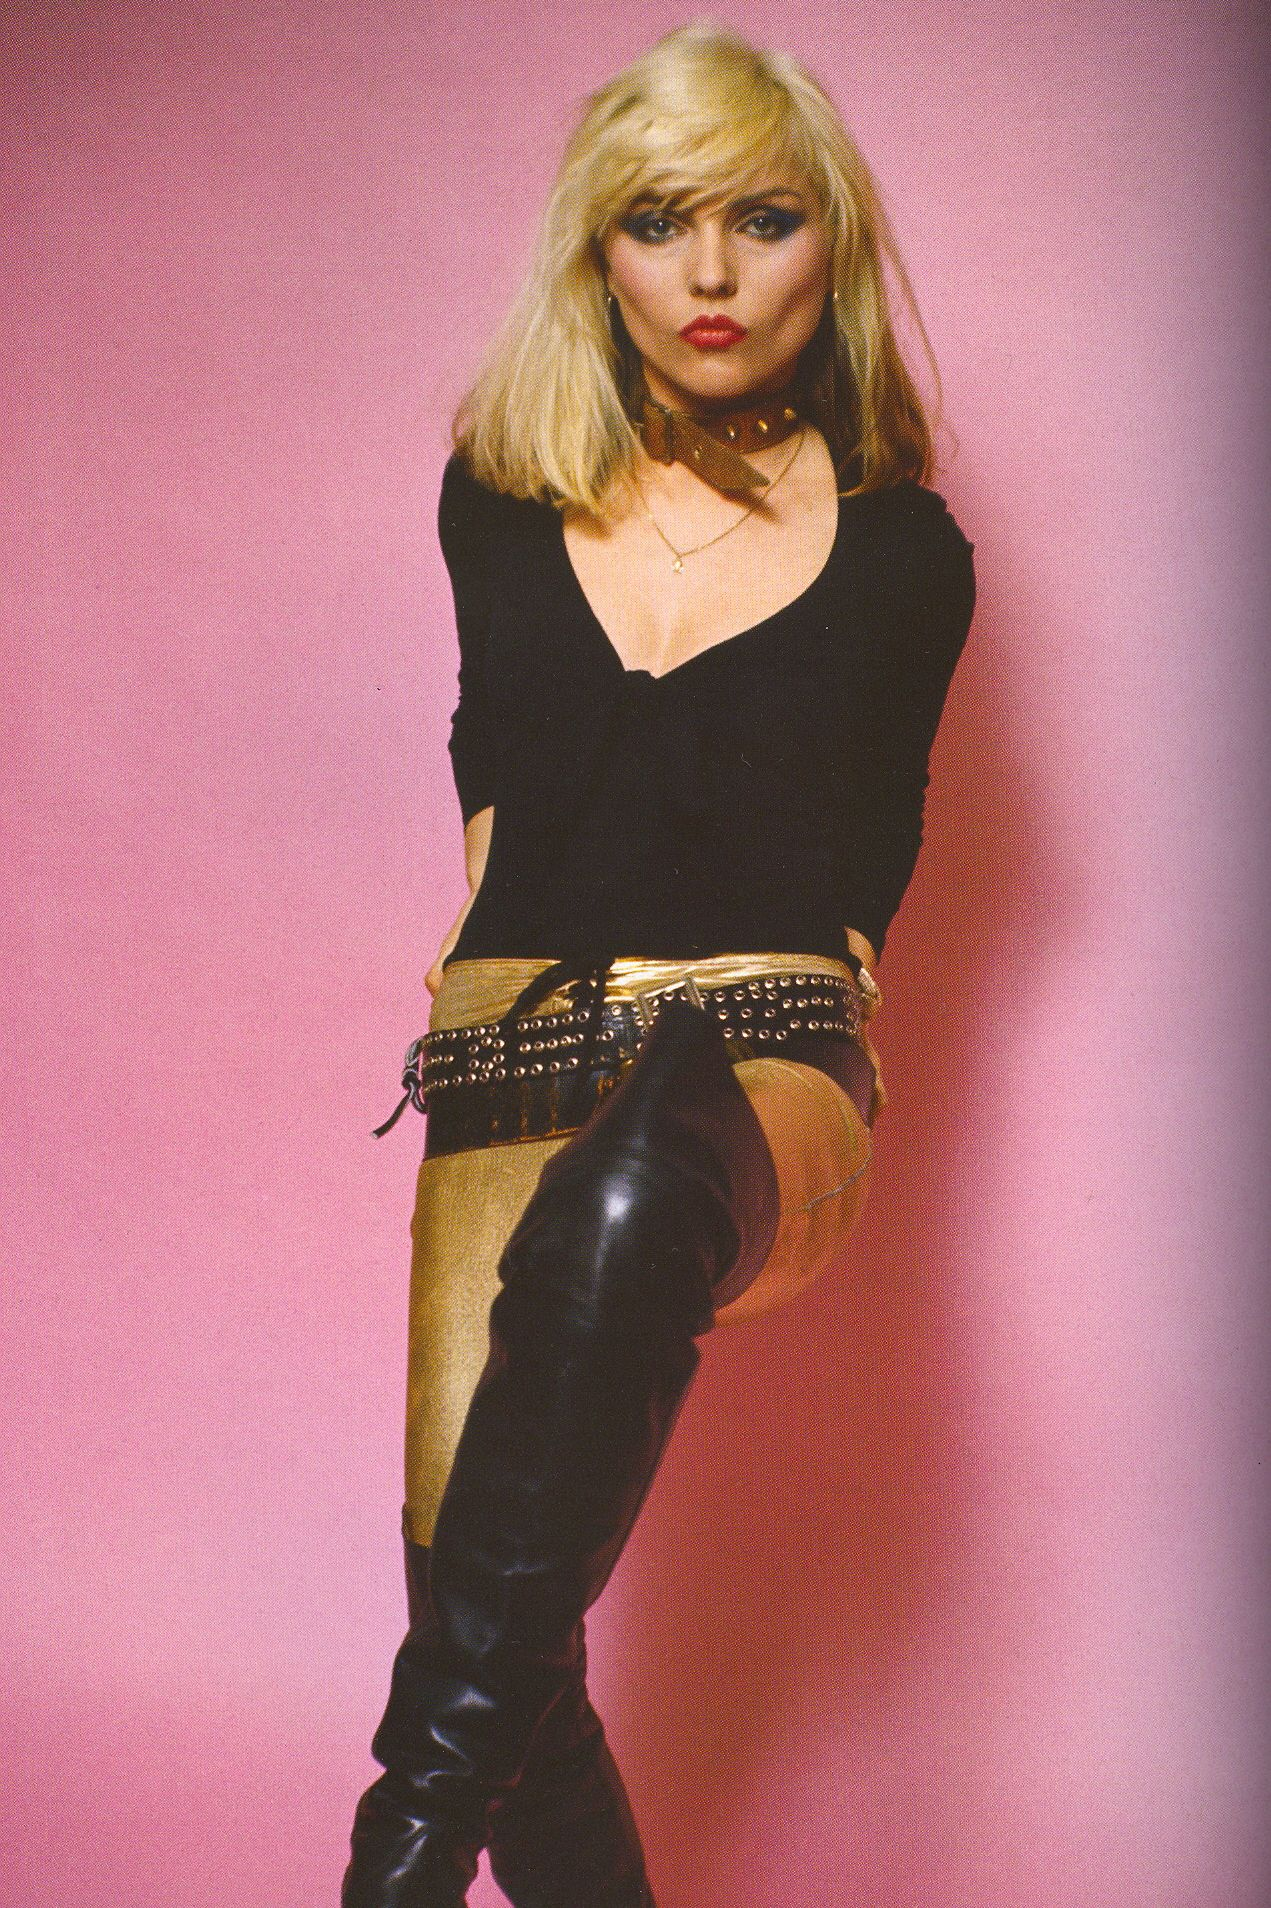 Debbie Harry / Blondie | 70s COSTUME PARTY | Pinterest